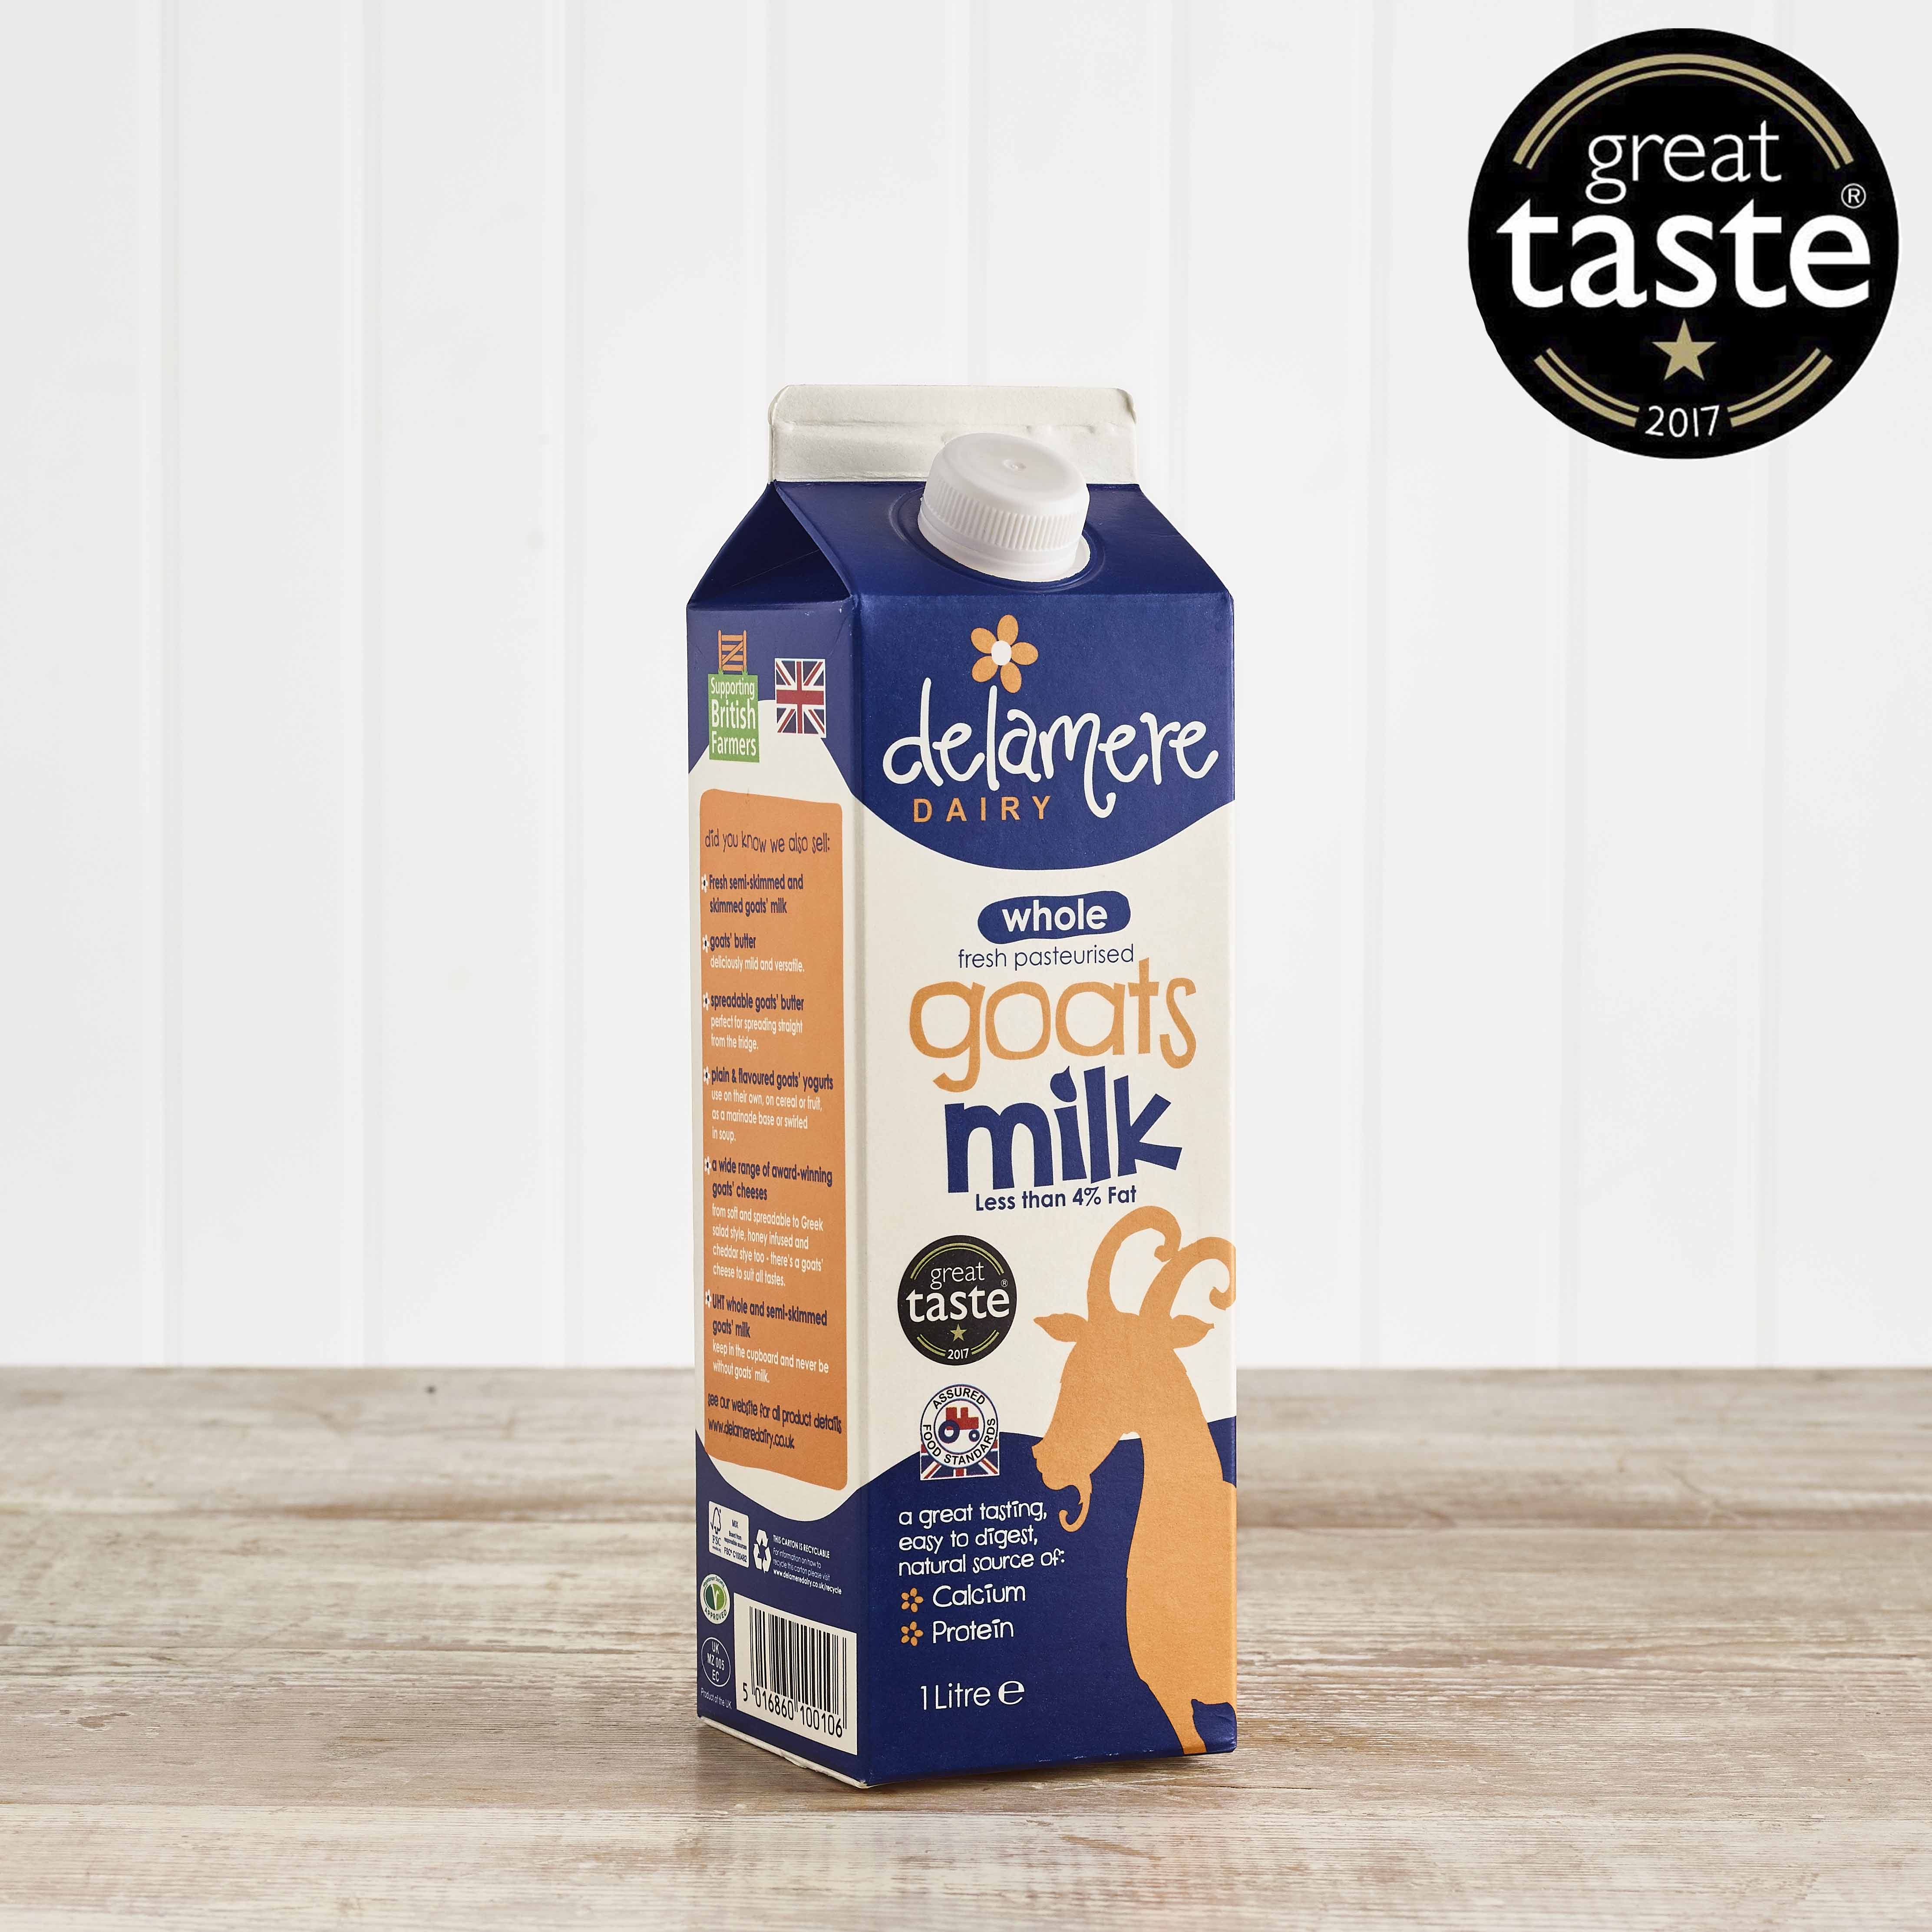 Delamere Dairy Fresh Whole Goats Milk, 1ltr